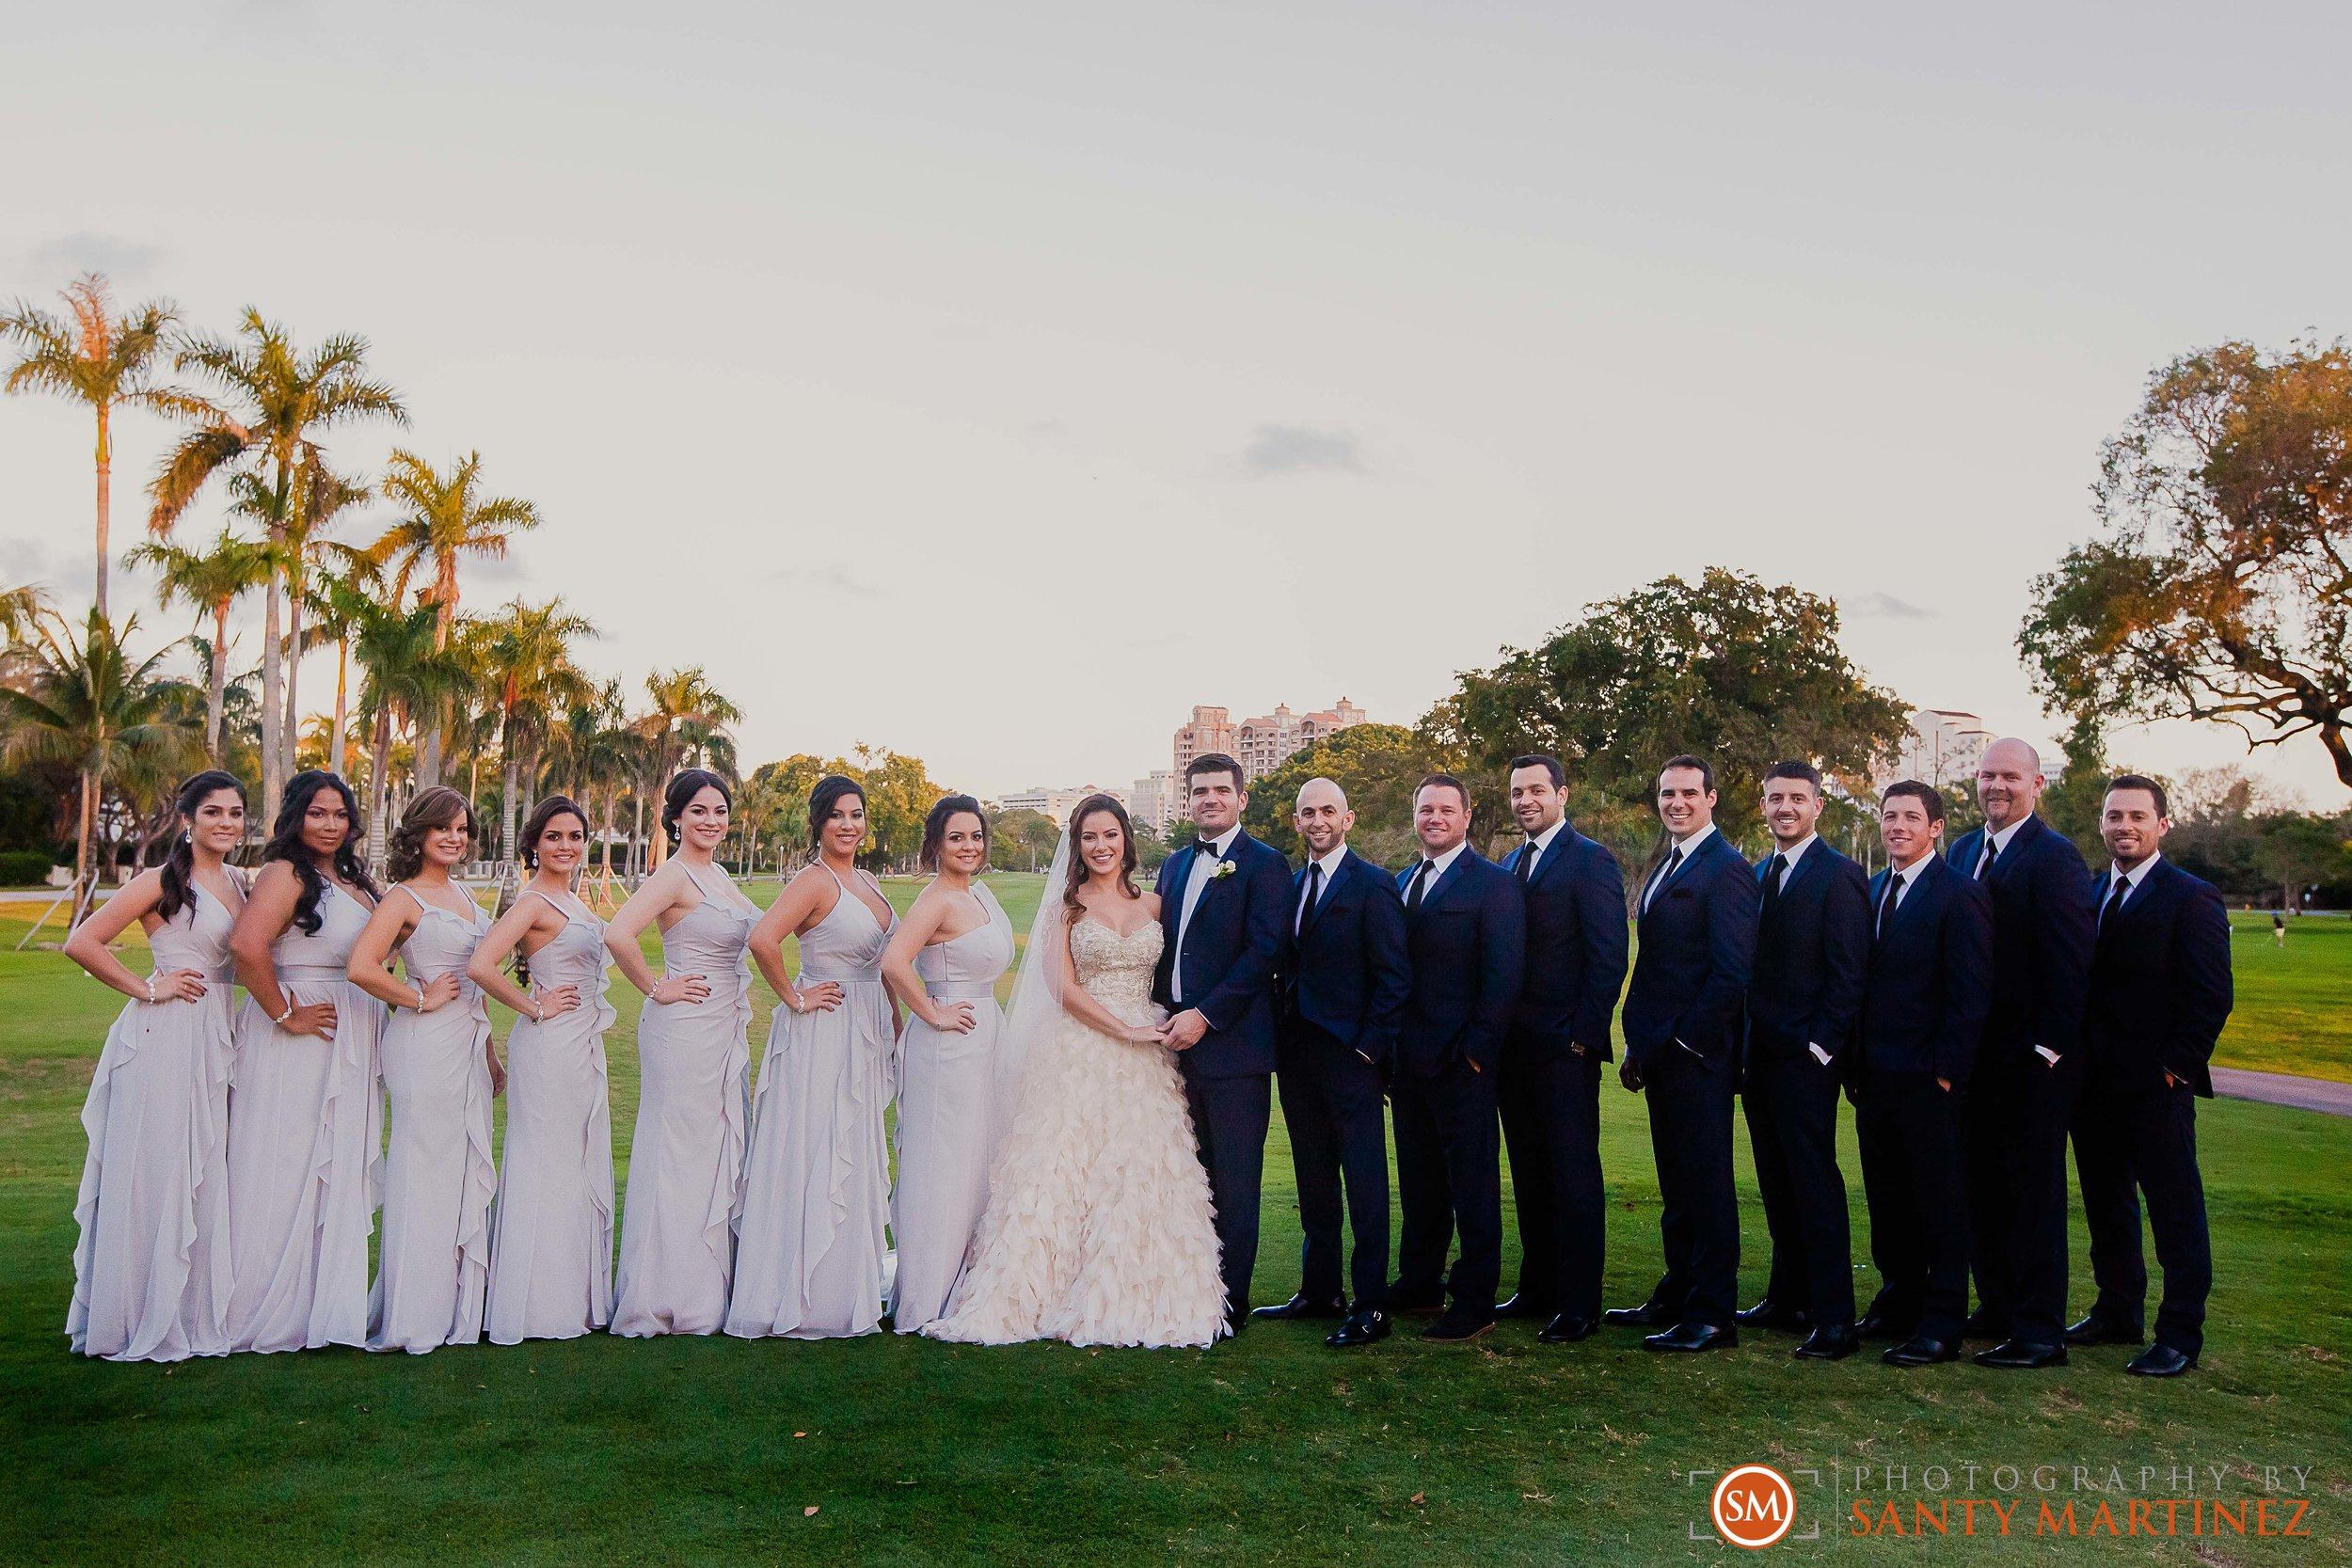 Wedding Coral Gables Country Club - Santy Martinez Photography-19.jpg